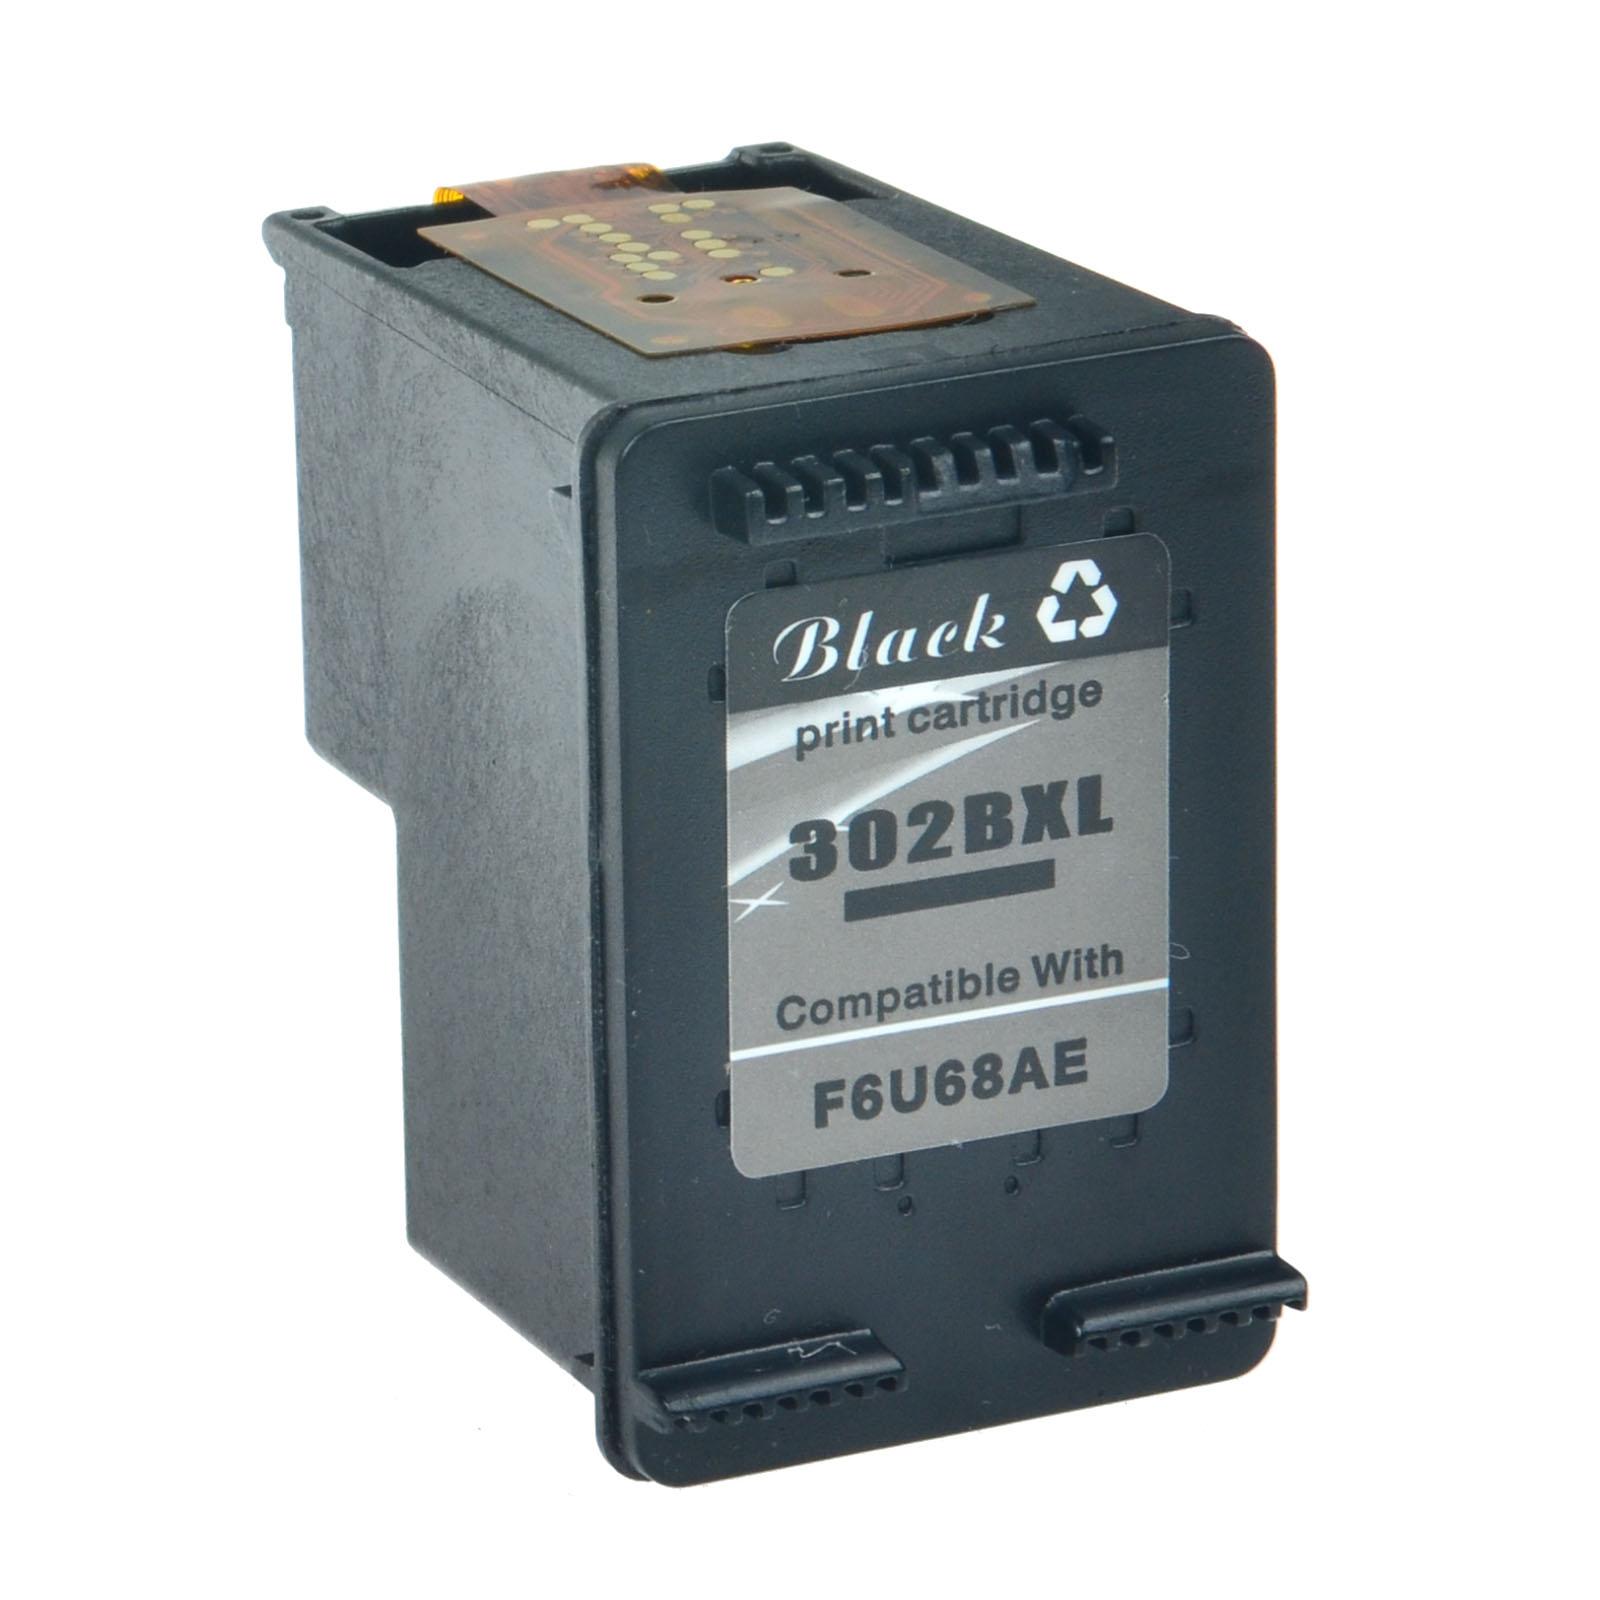 5PK-Black-Ink-Cartridge-Compatible-for-HP-302XL-DeskJet-1110-2130-2132-3636-3637 thumbnail 2